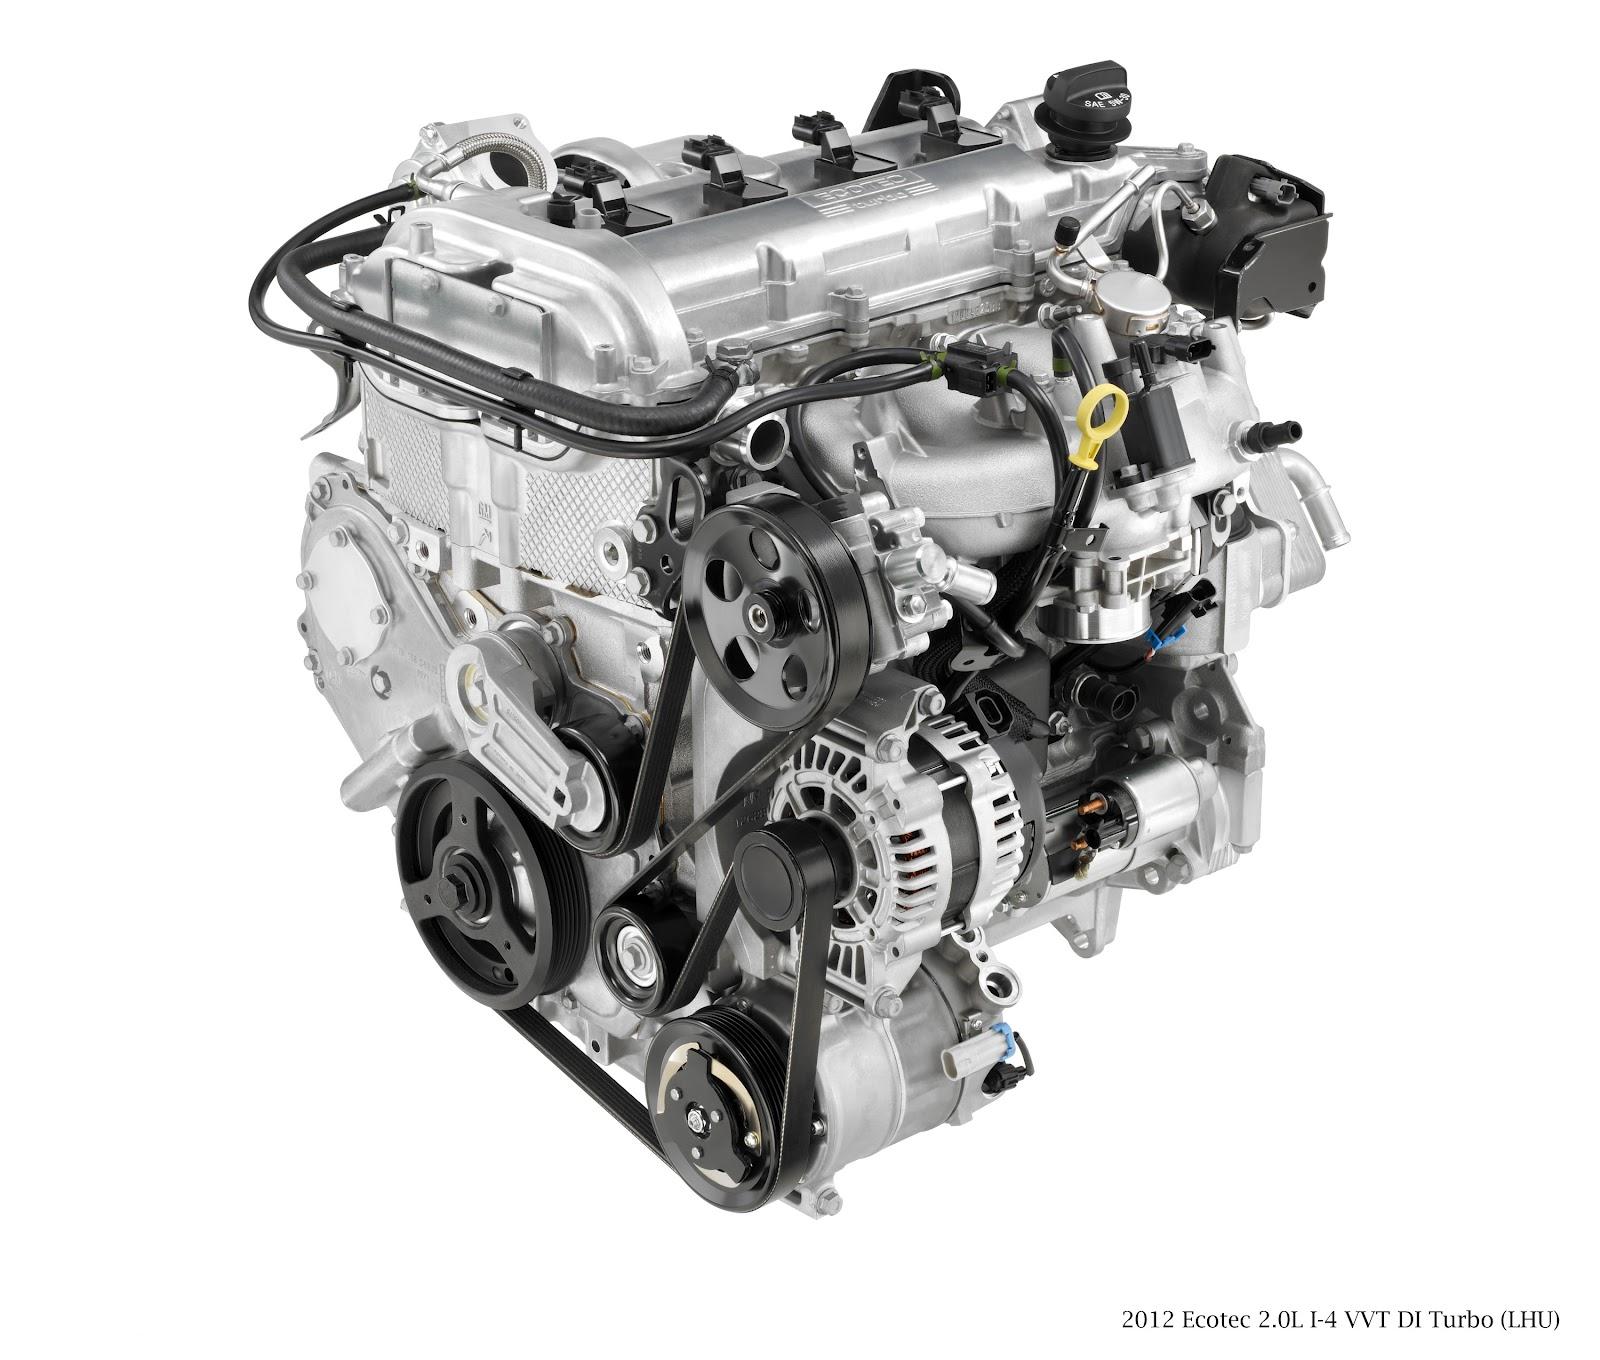 2010 - [Buick] Verano / Excelle - Page 3 Ecotec+2.0L+I-4+VVT+DI+Turbo+(LHU)